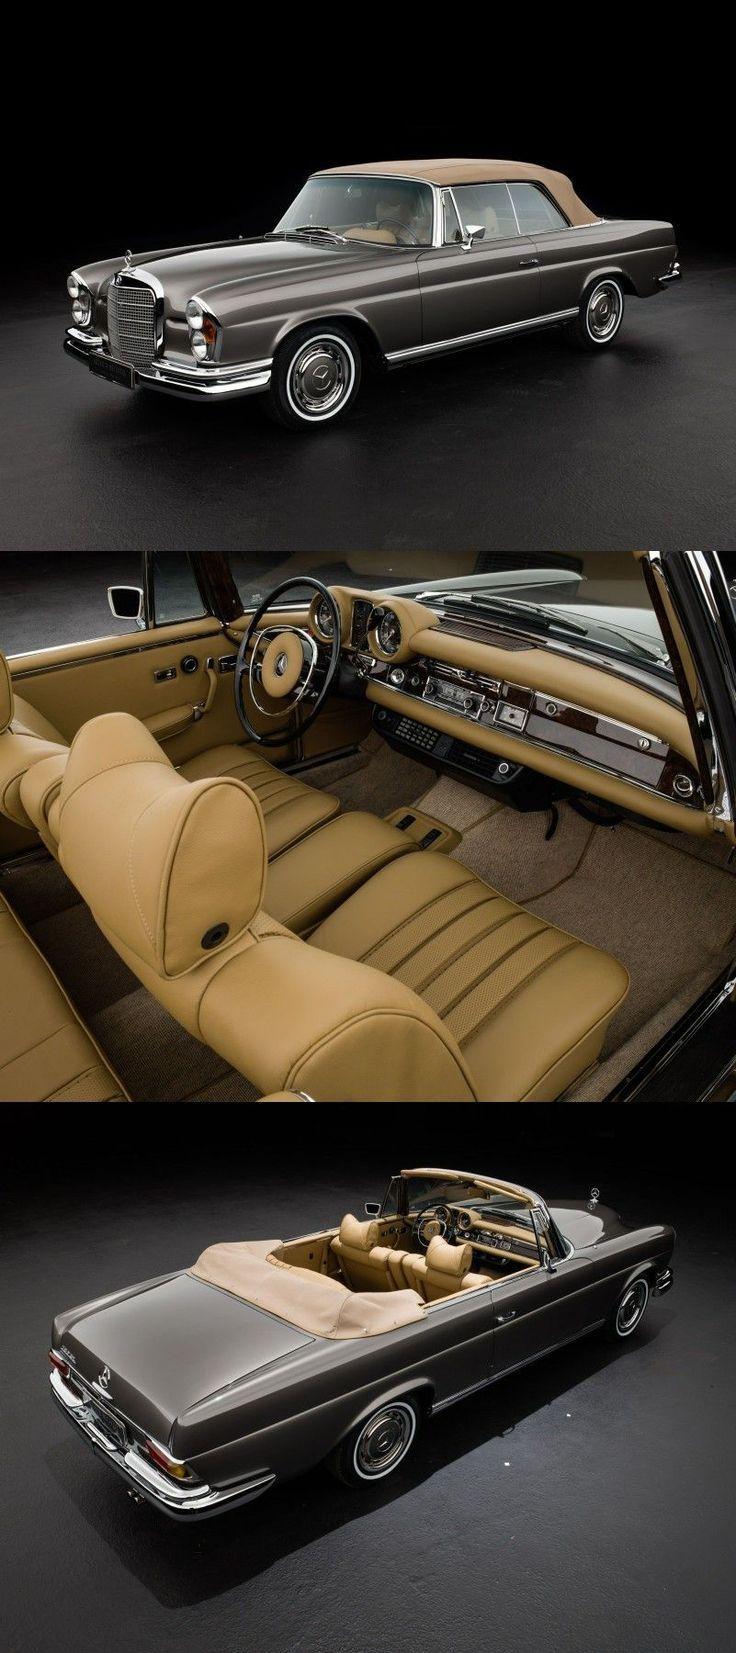 1969 Mercedes Benz 280 SE 3.5 V8 Cabrio - Classic Car News And Images - #Benz #cabrio #Car #Classic #Images #Mercedes #News #SE #V8 - 1969 Mercedes Benz 280 SE 3.5 V8 Cabrio - Classic Car News And Images